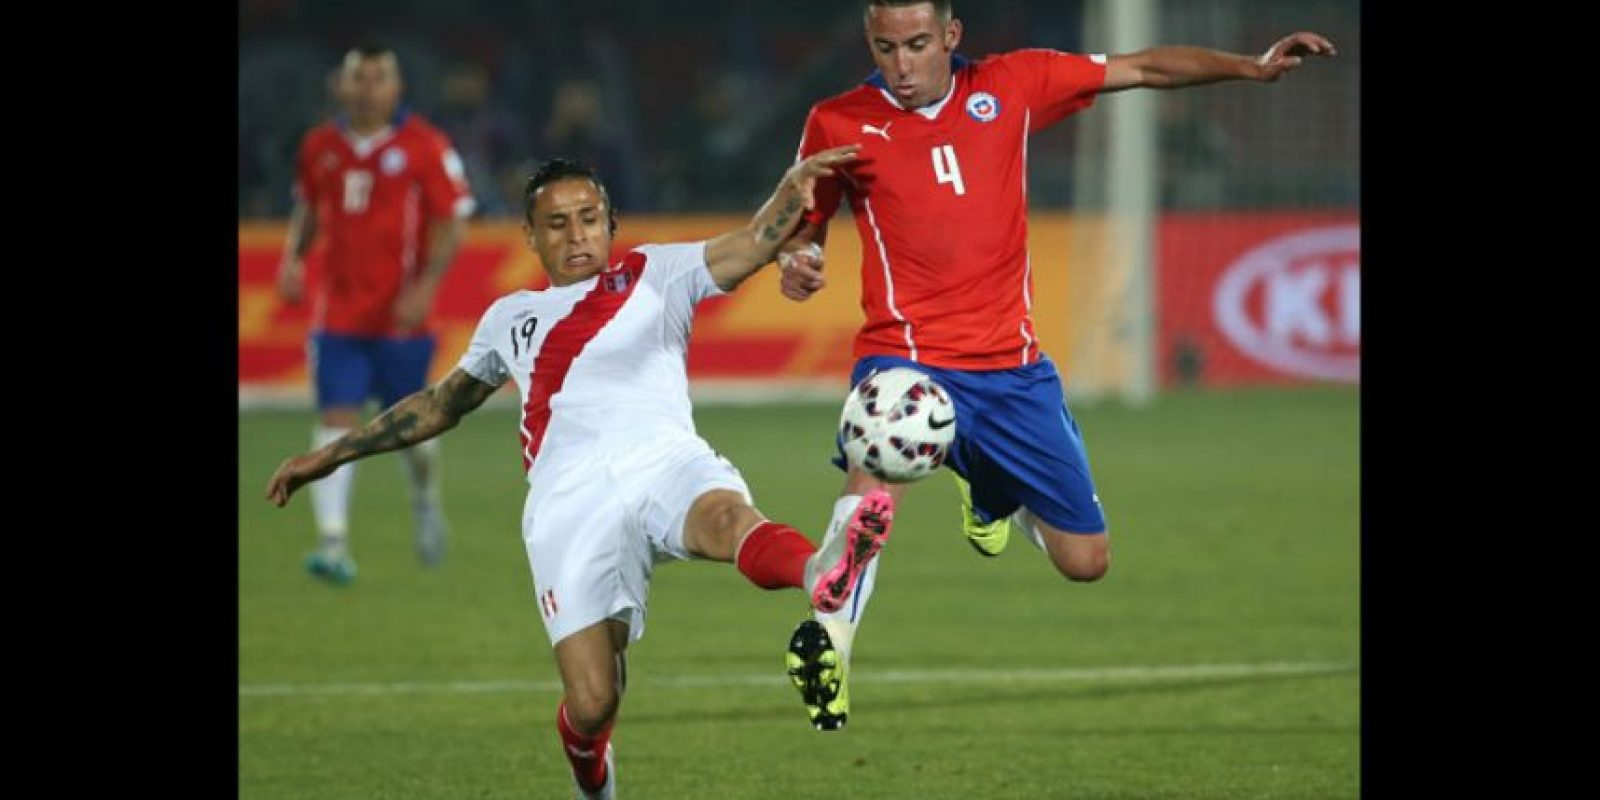 2. Perú vs. Chile en Lima / Jornada 2 / 13 de octubre Foto:Getty Images